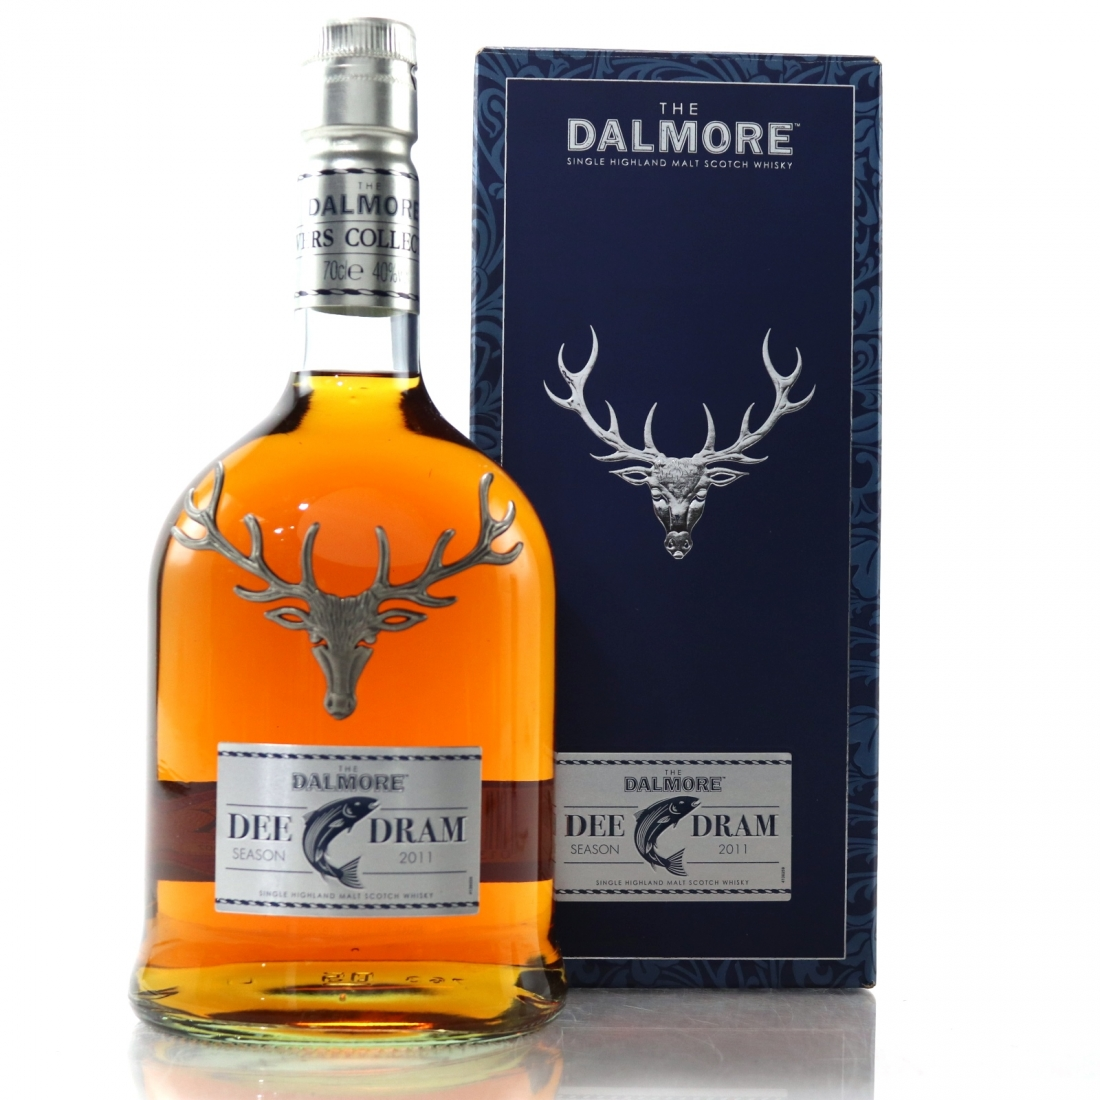 Dalmore Dee Dram / 2011 Season